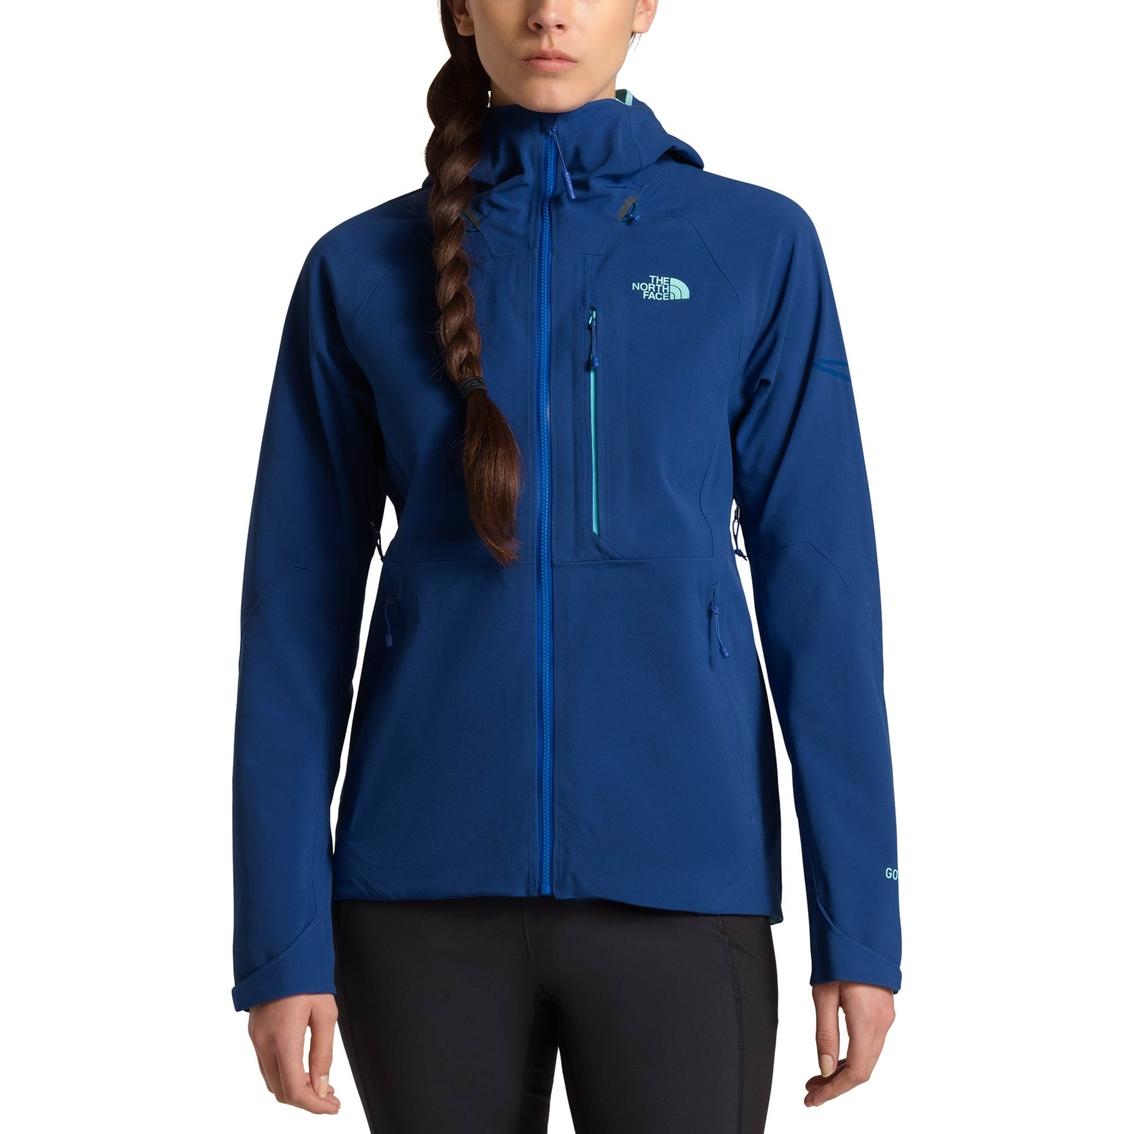 56afb69d4 The North Face Apex Flex Gtx 2.0 Jacket | Jackets | Apparel | Shop ...